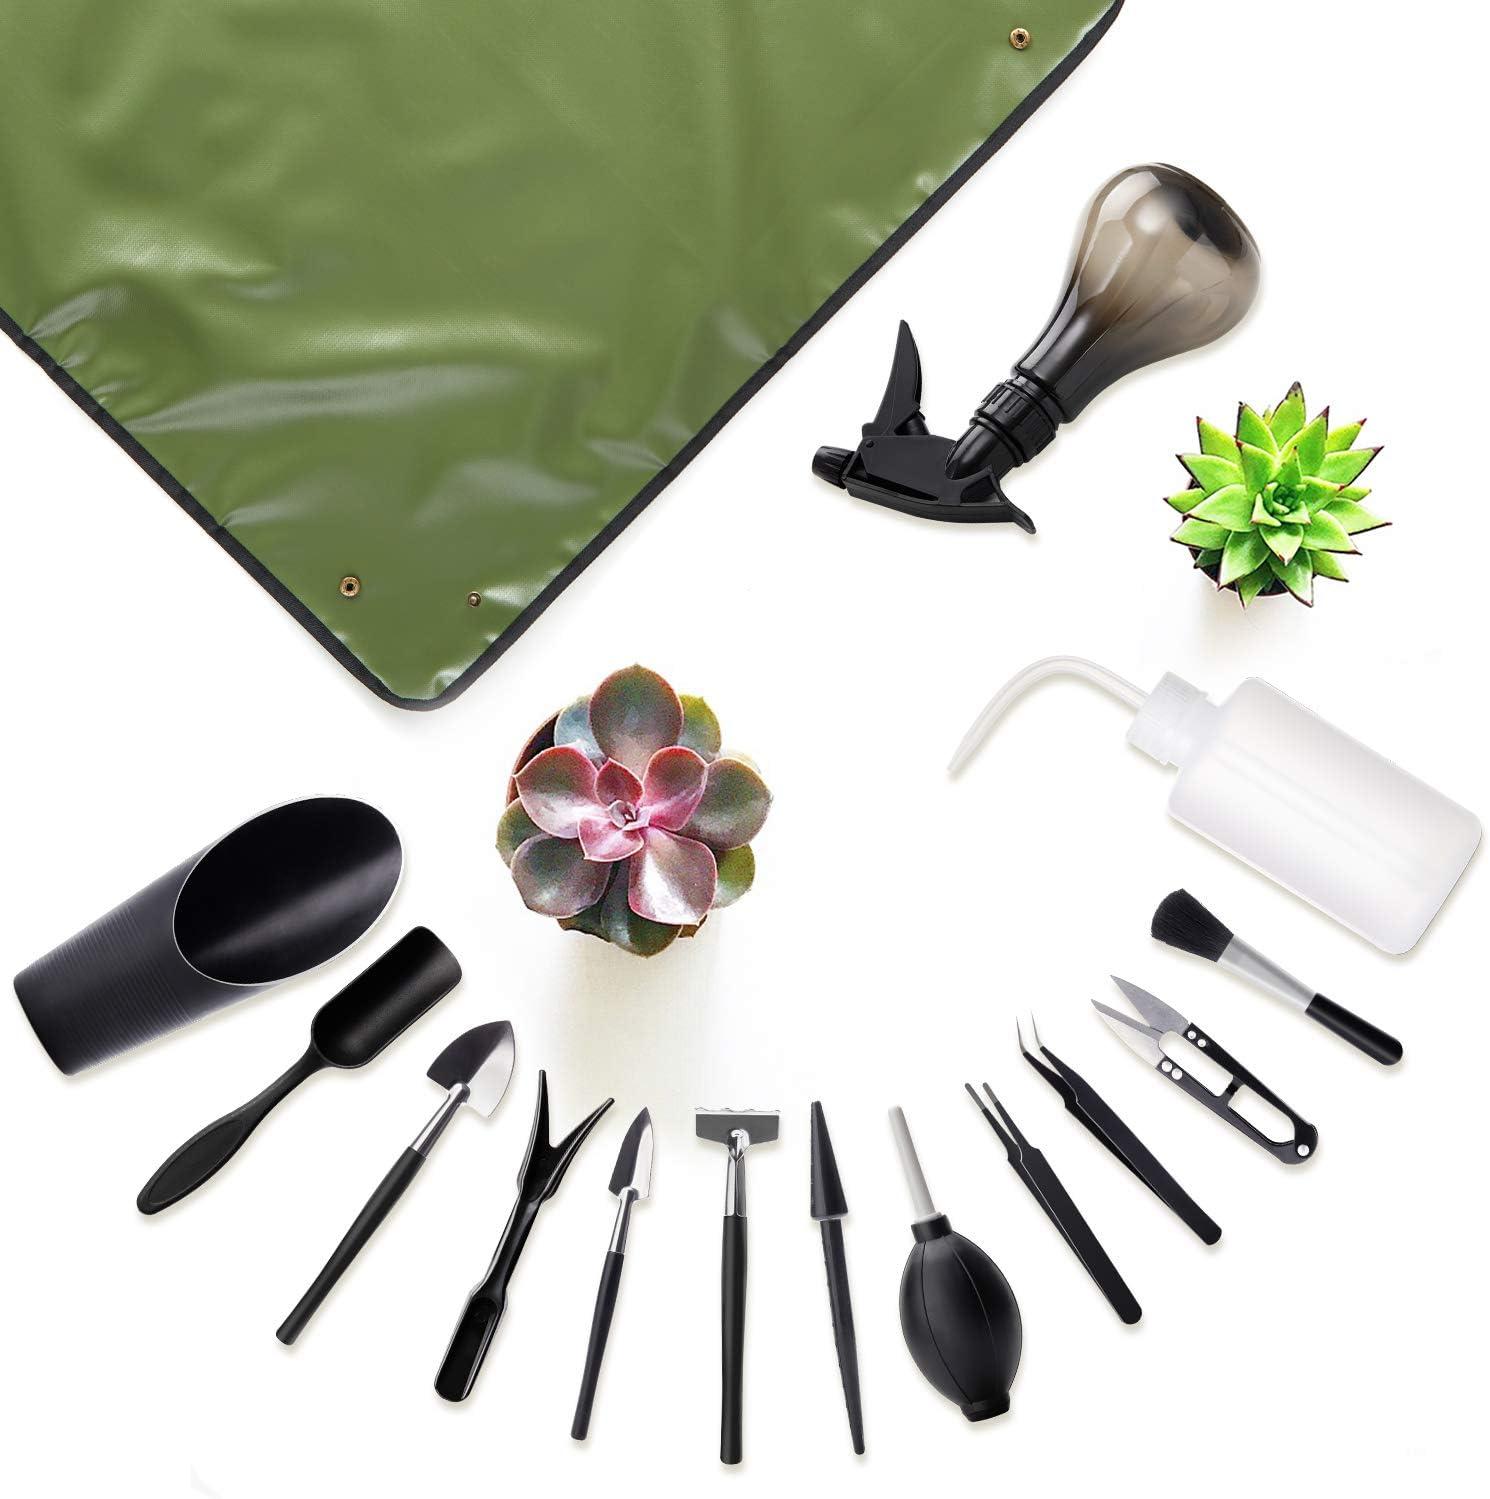 Floridliving Succulent Tools Set, 14pcs Mini Garden Hand Tools + 1 Waterproof & Foldable Plant Repotting Mat, Garden Tool Set Plant Tools for Indoor Miniature Fairy Garden Plant Care